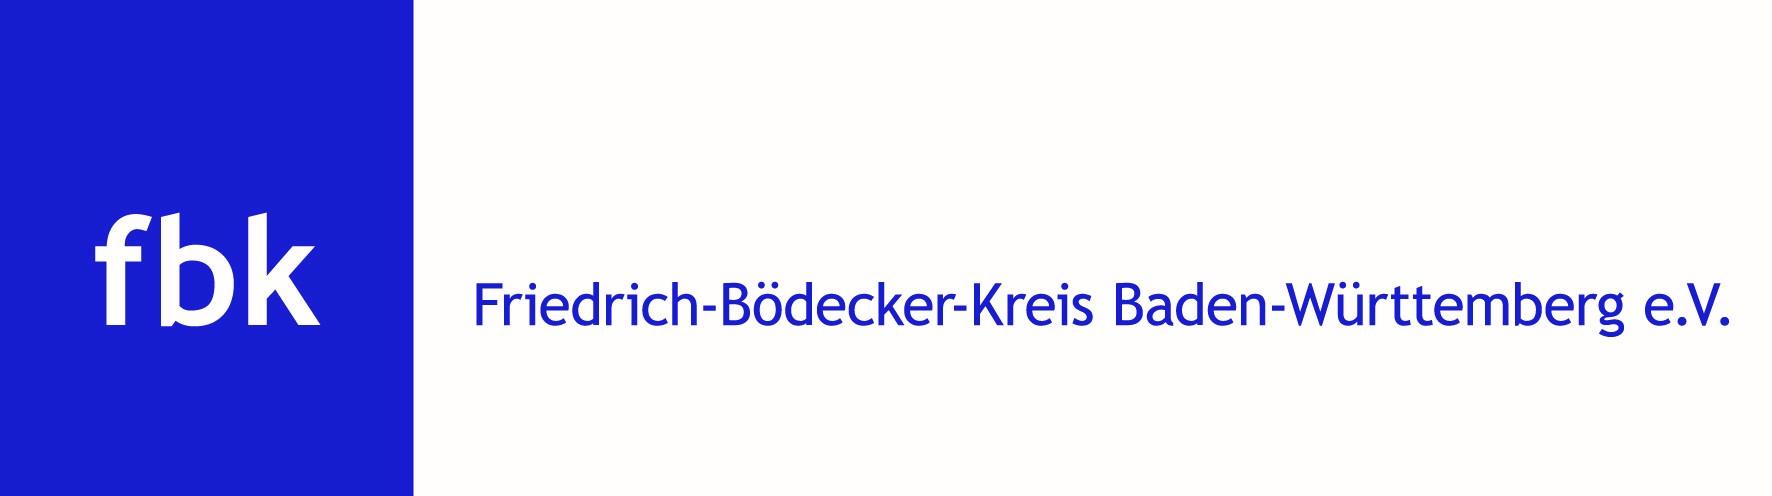 Logo Friedrich-Bödecker-Kreis